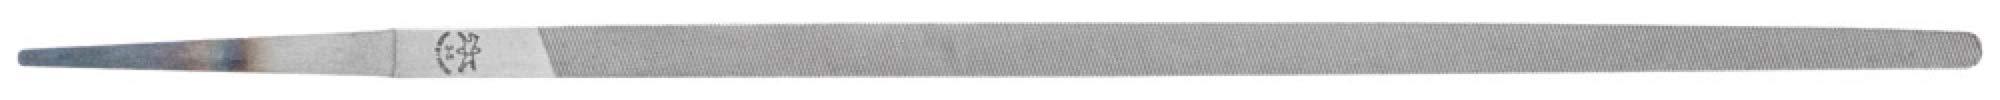 PFERD 11092 10'' Square File Smooth Cut (10pk)